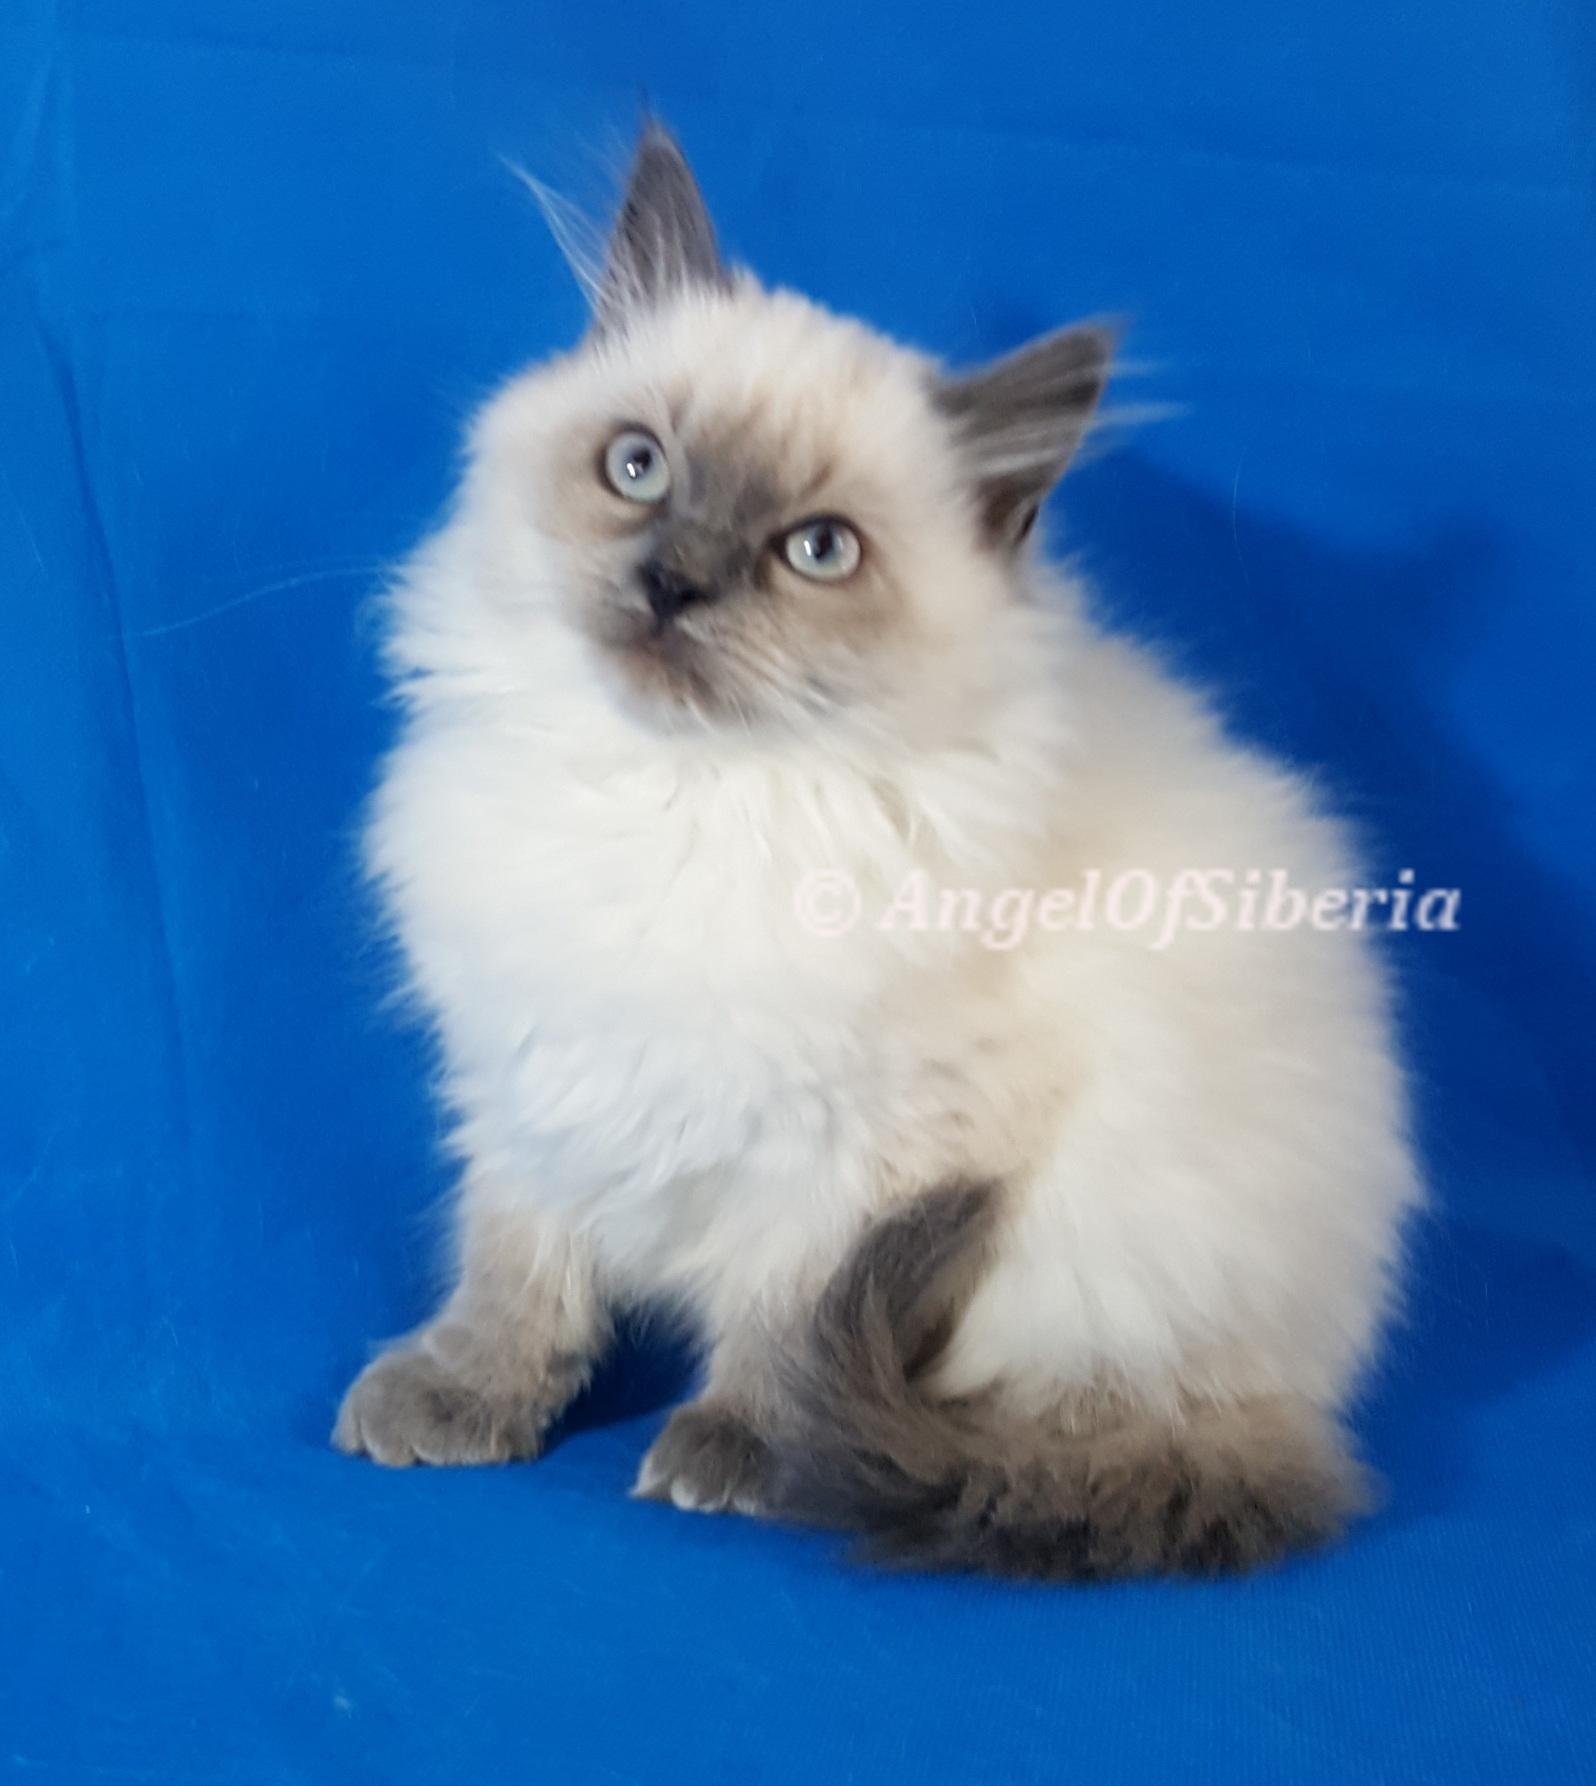 Blue Point Neva Masquerade Cat Hypoallergenic I Angel of Siberia